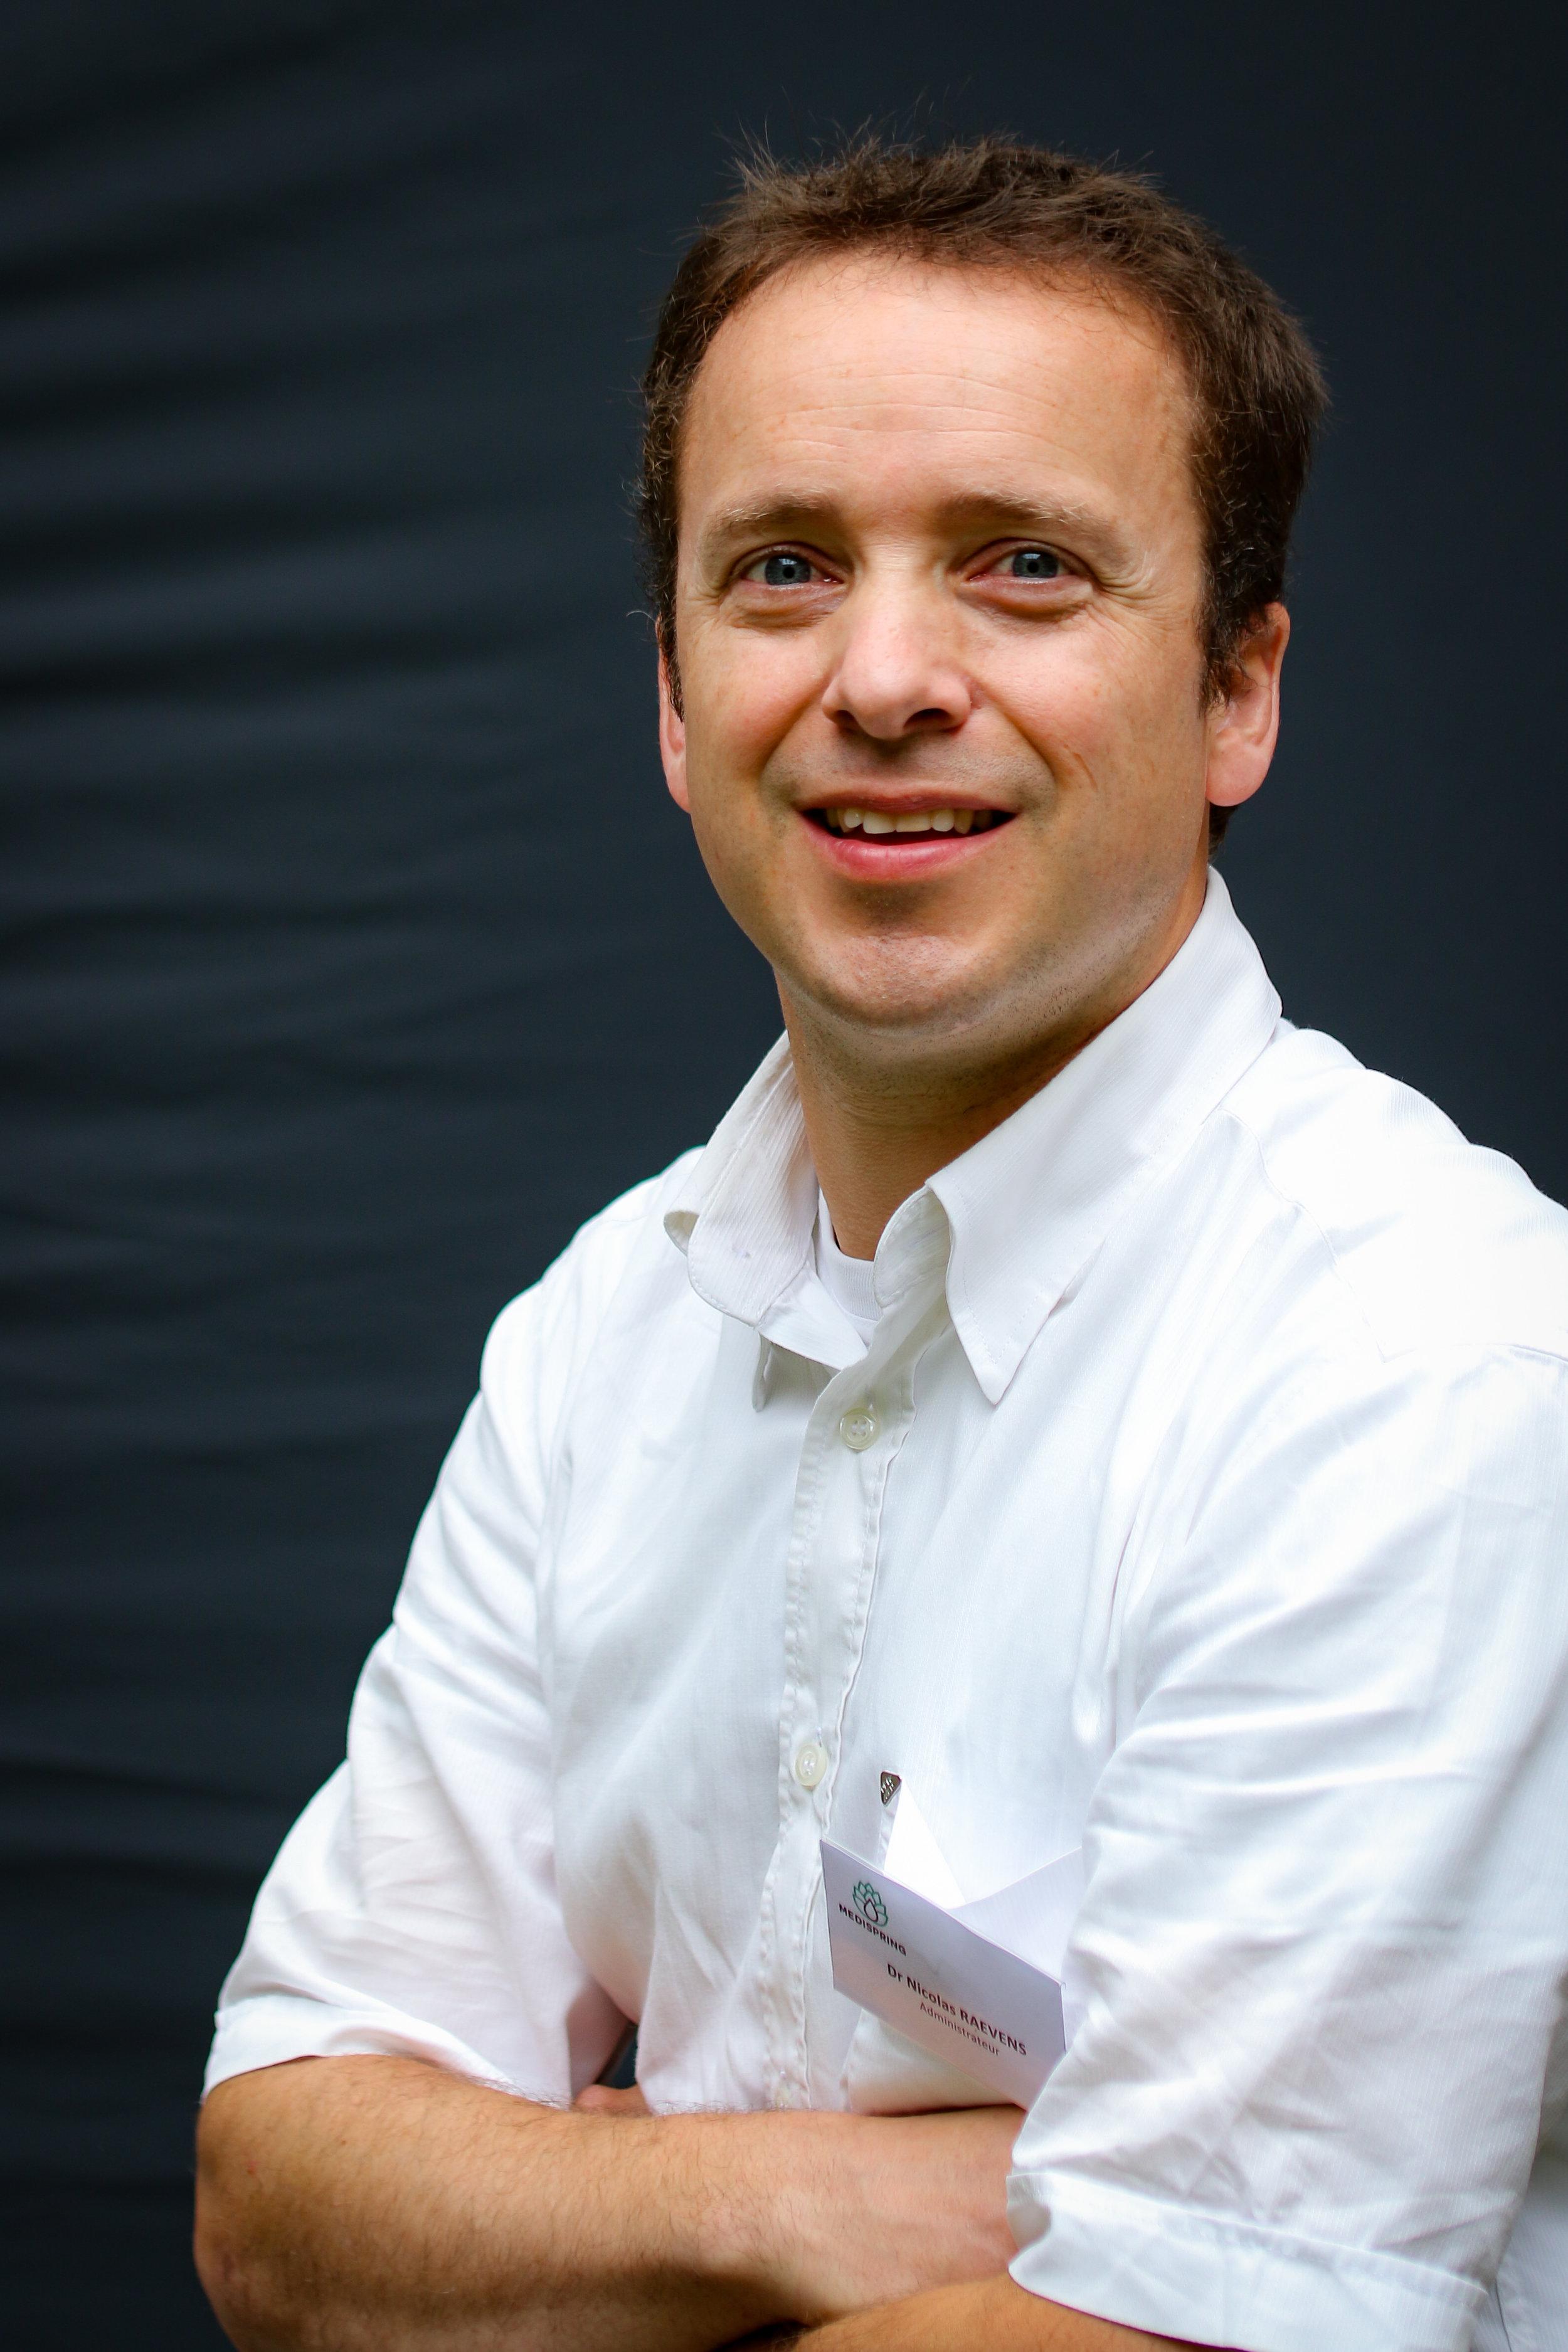 Dr. Nicolas Raevens